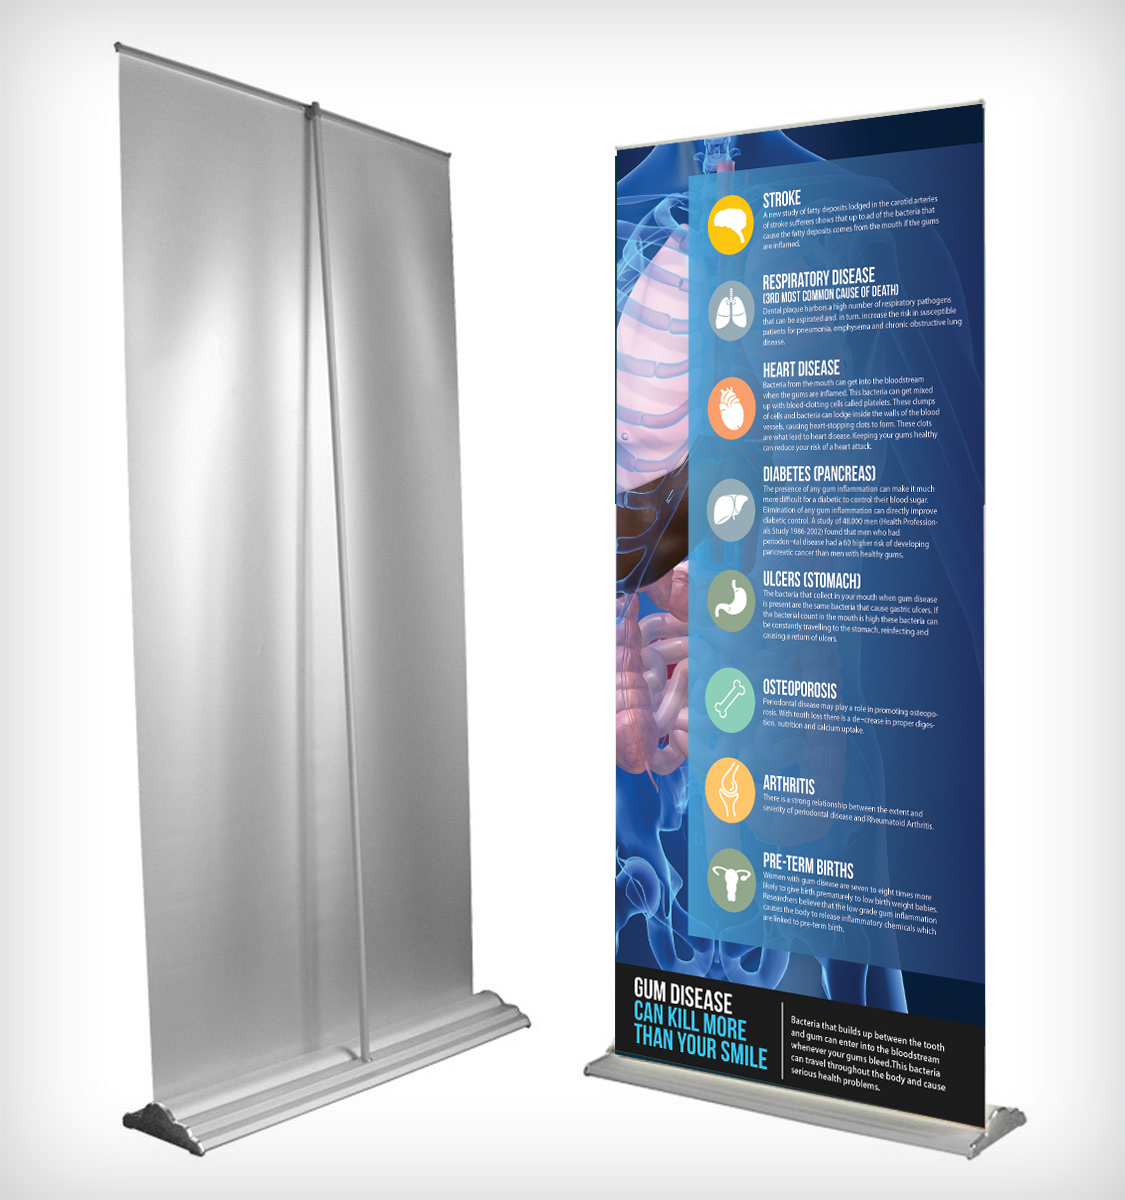 Poster design fee - Poster Design By Alessandroevge For Dental Office Needs Pop Up Banner Created Design 6695799